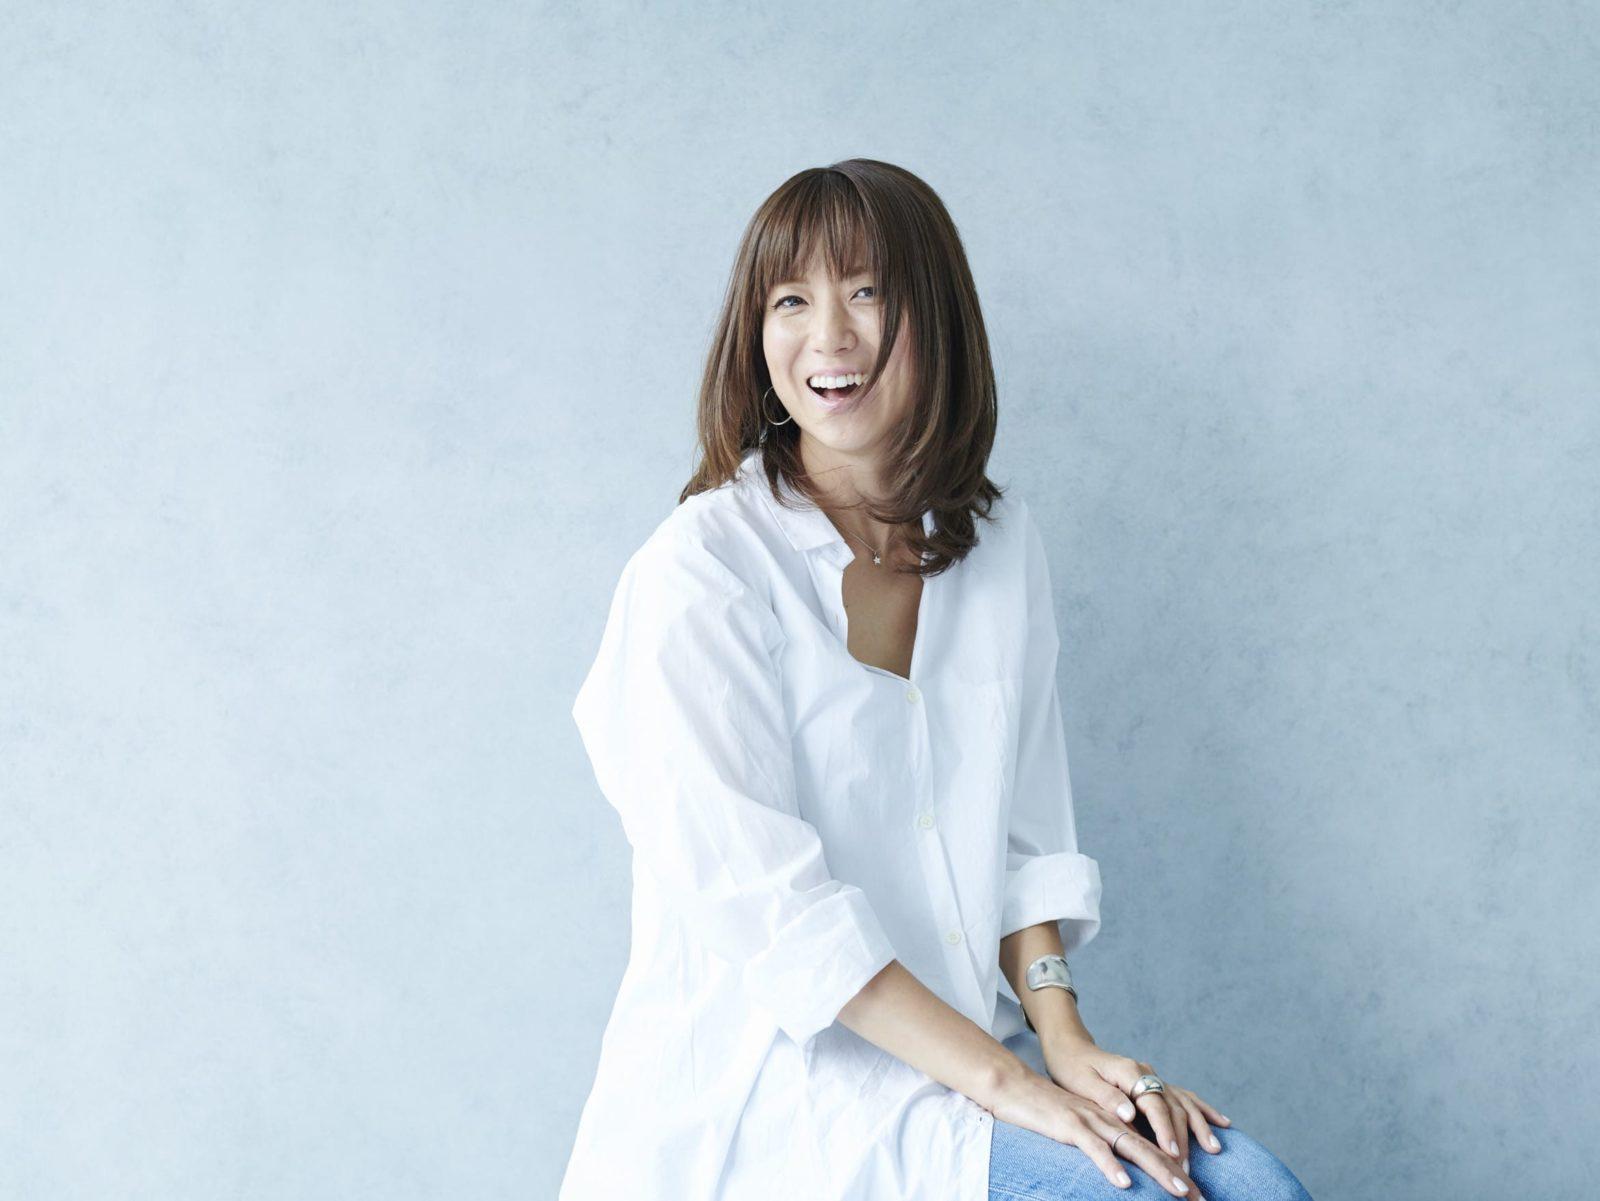 hitomi、名曲『LOVE 2000』セルフリメイク 高橋尚子も再絶賛サムネイル画像